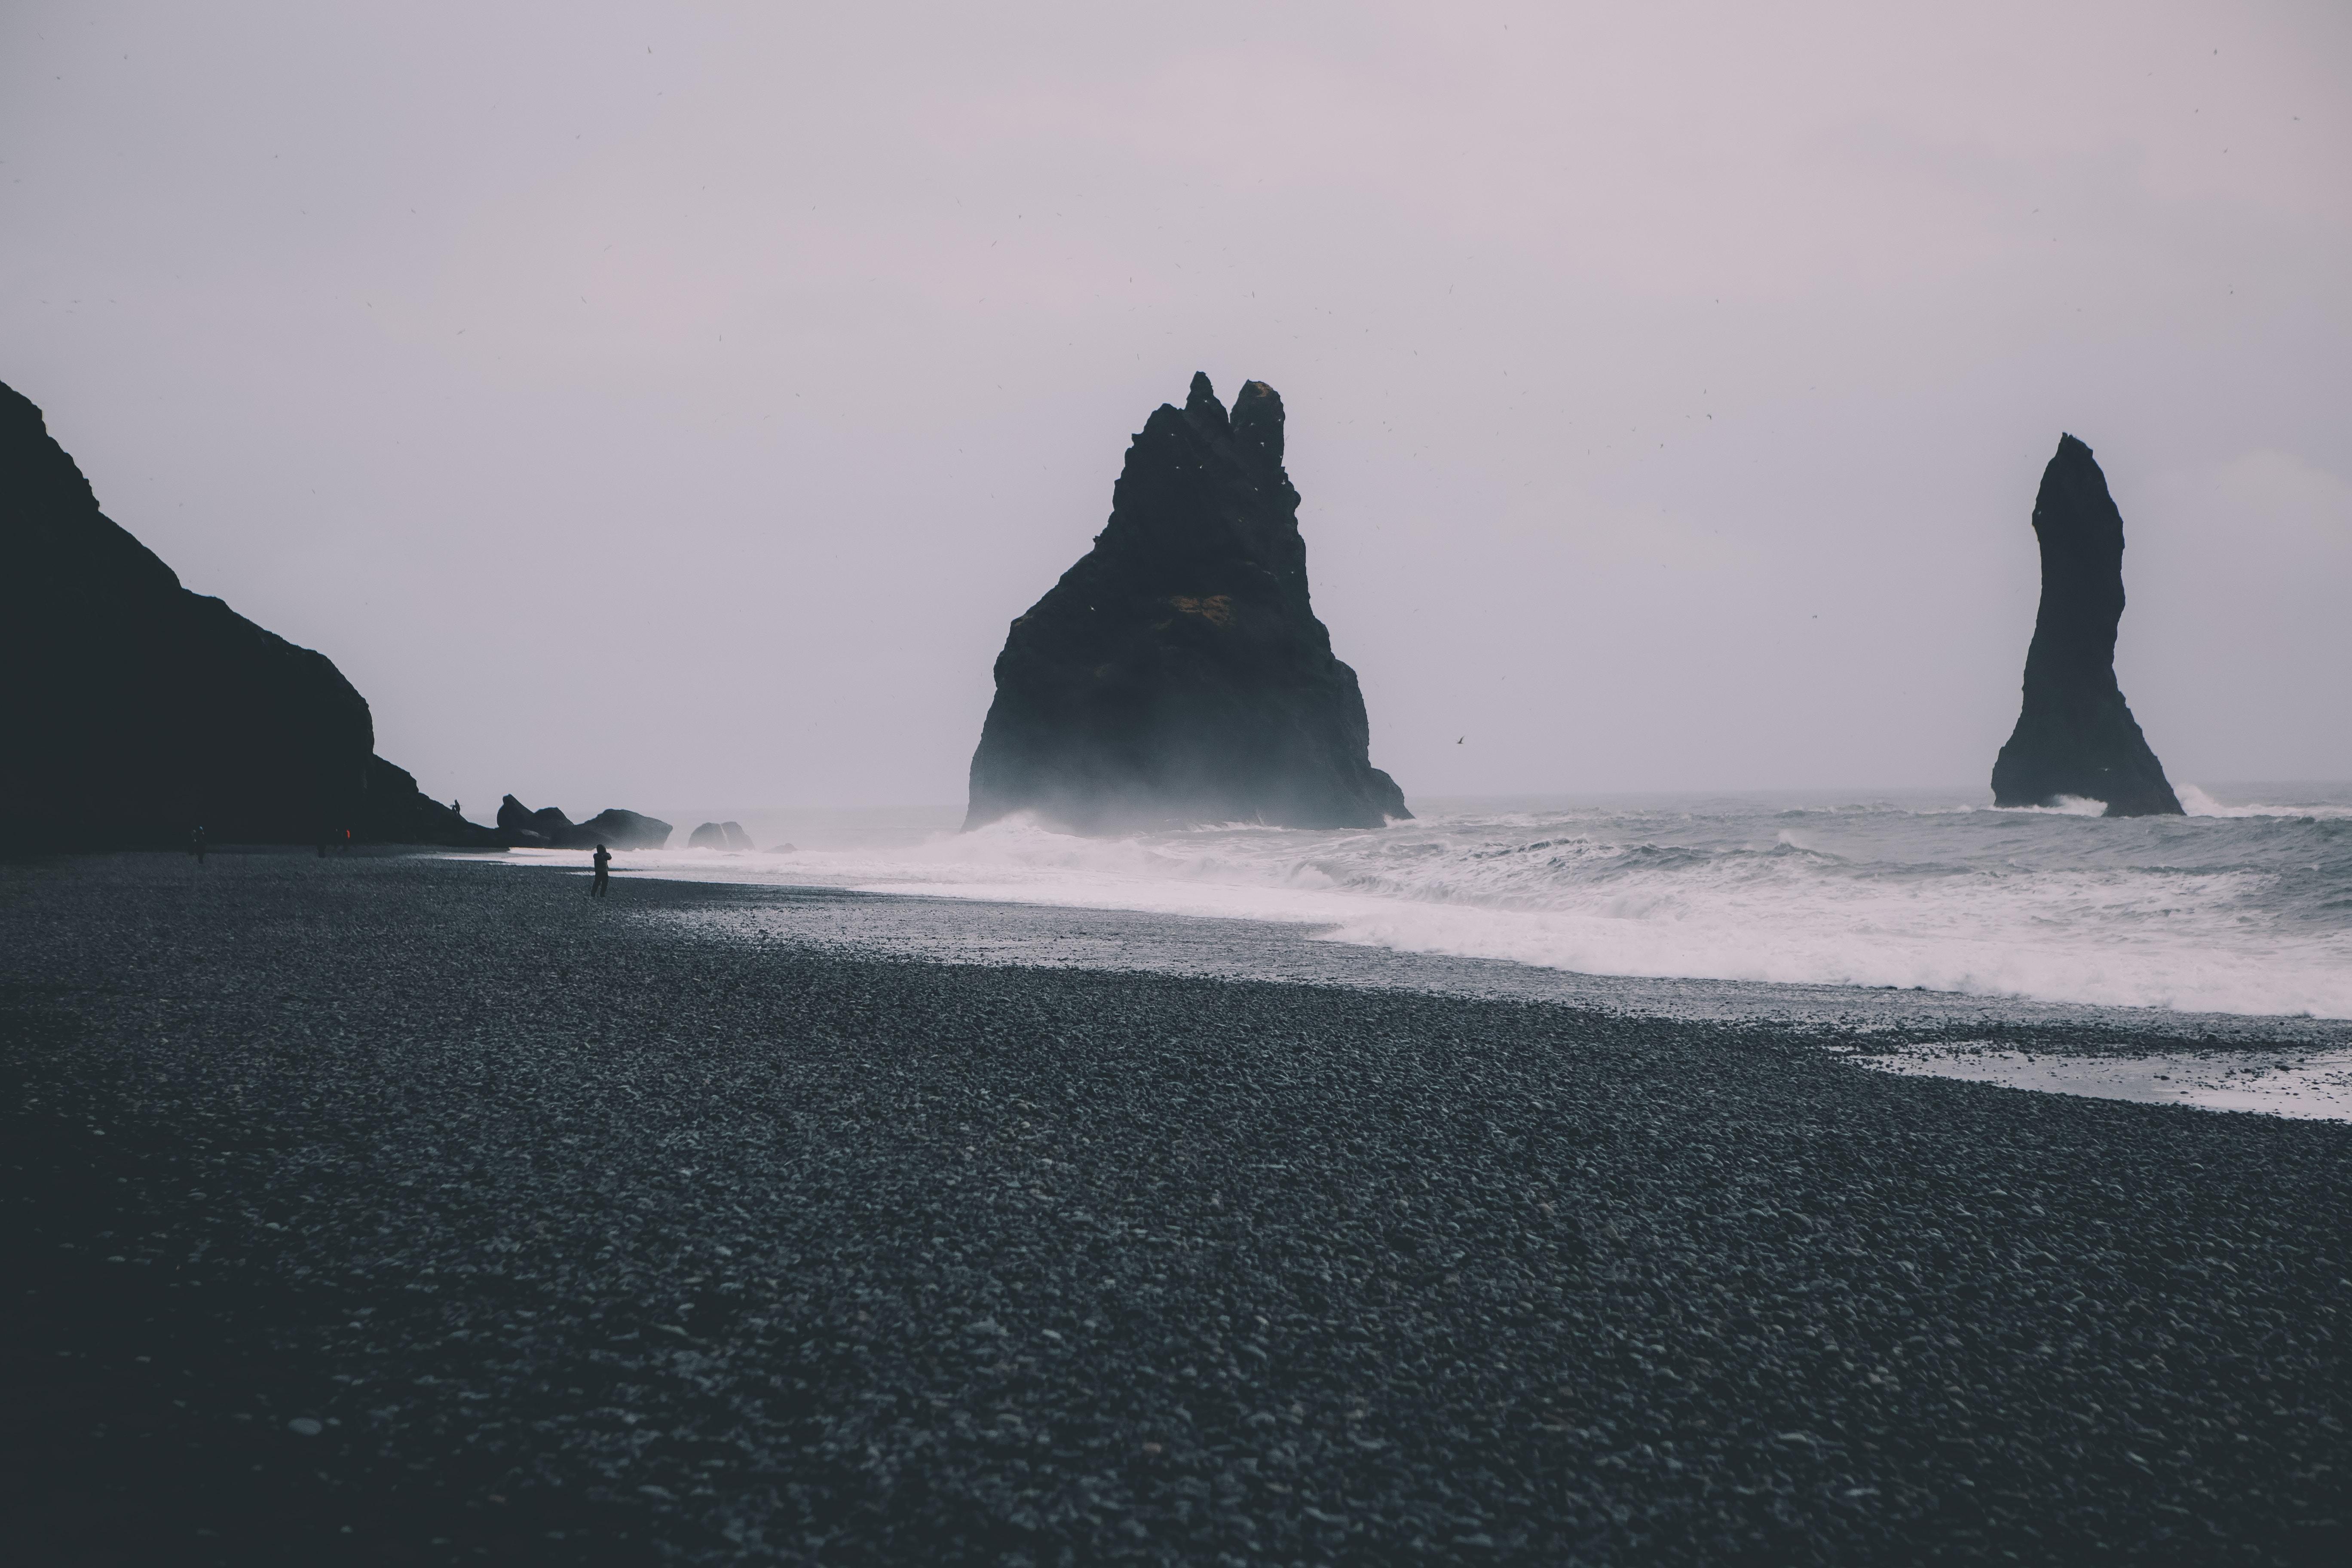 Man standing on a black sand beach on an overcast day